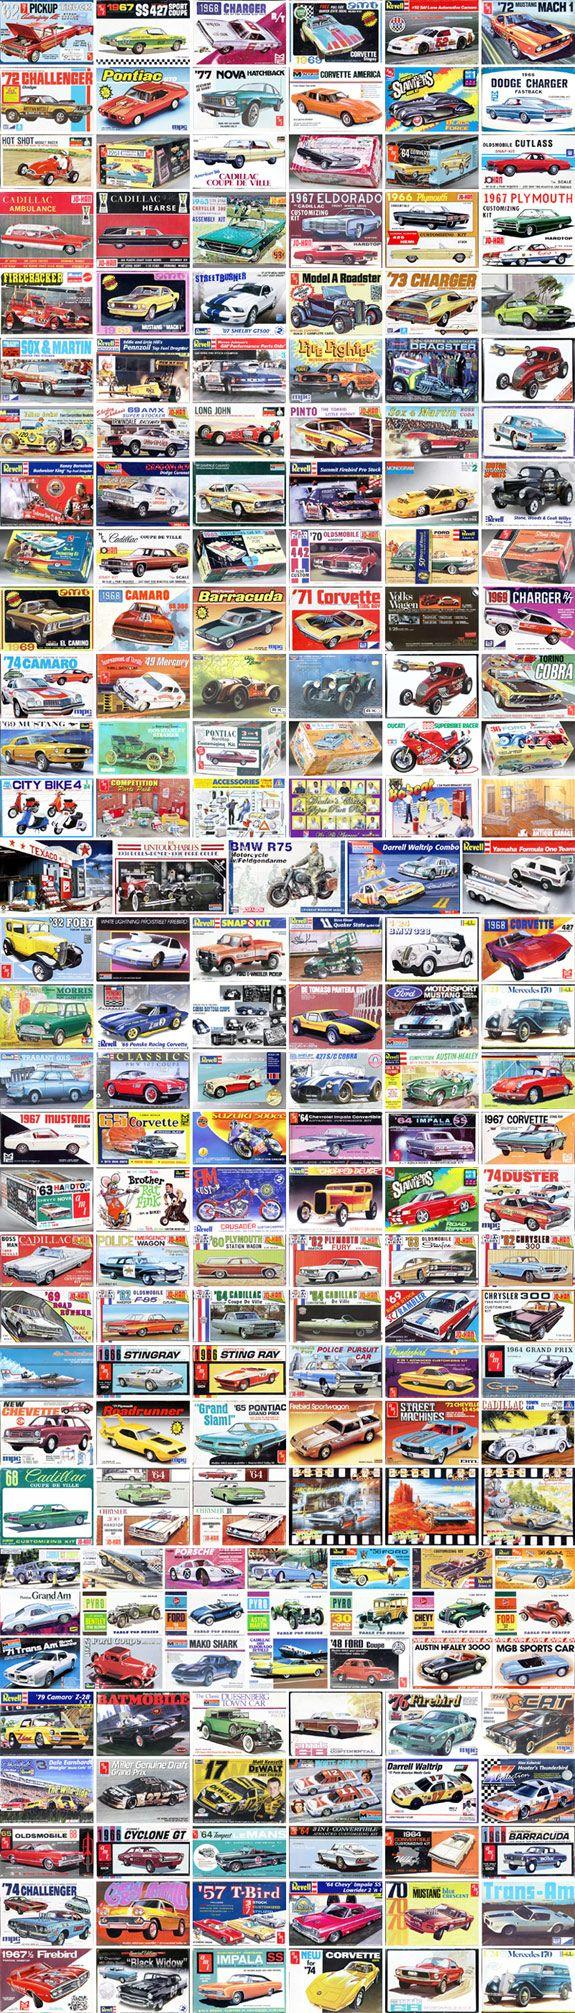 model car kits spotlighthobbies hobbies